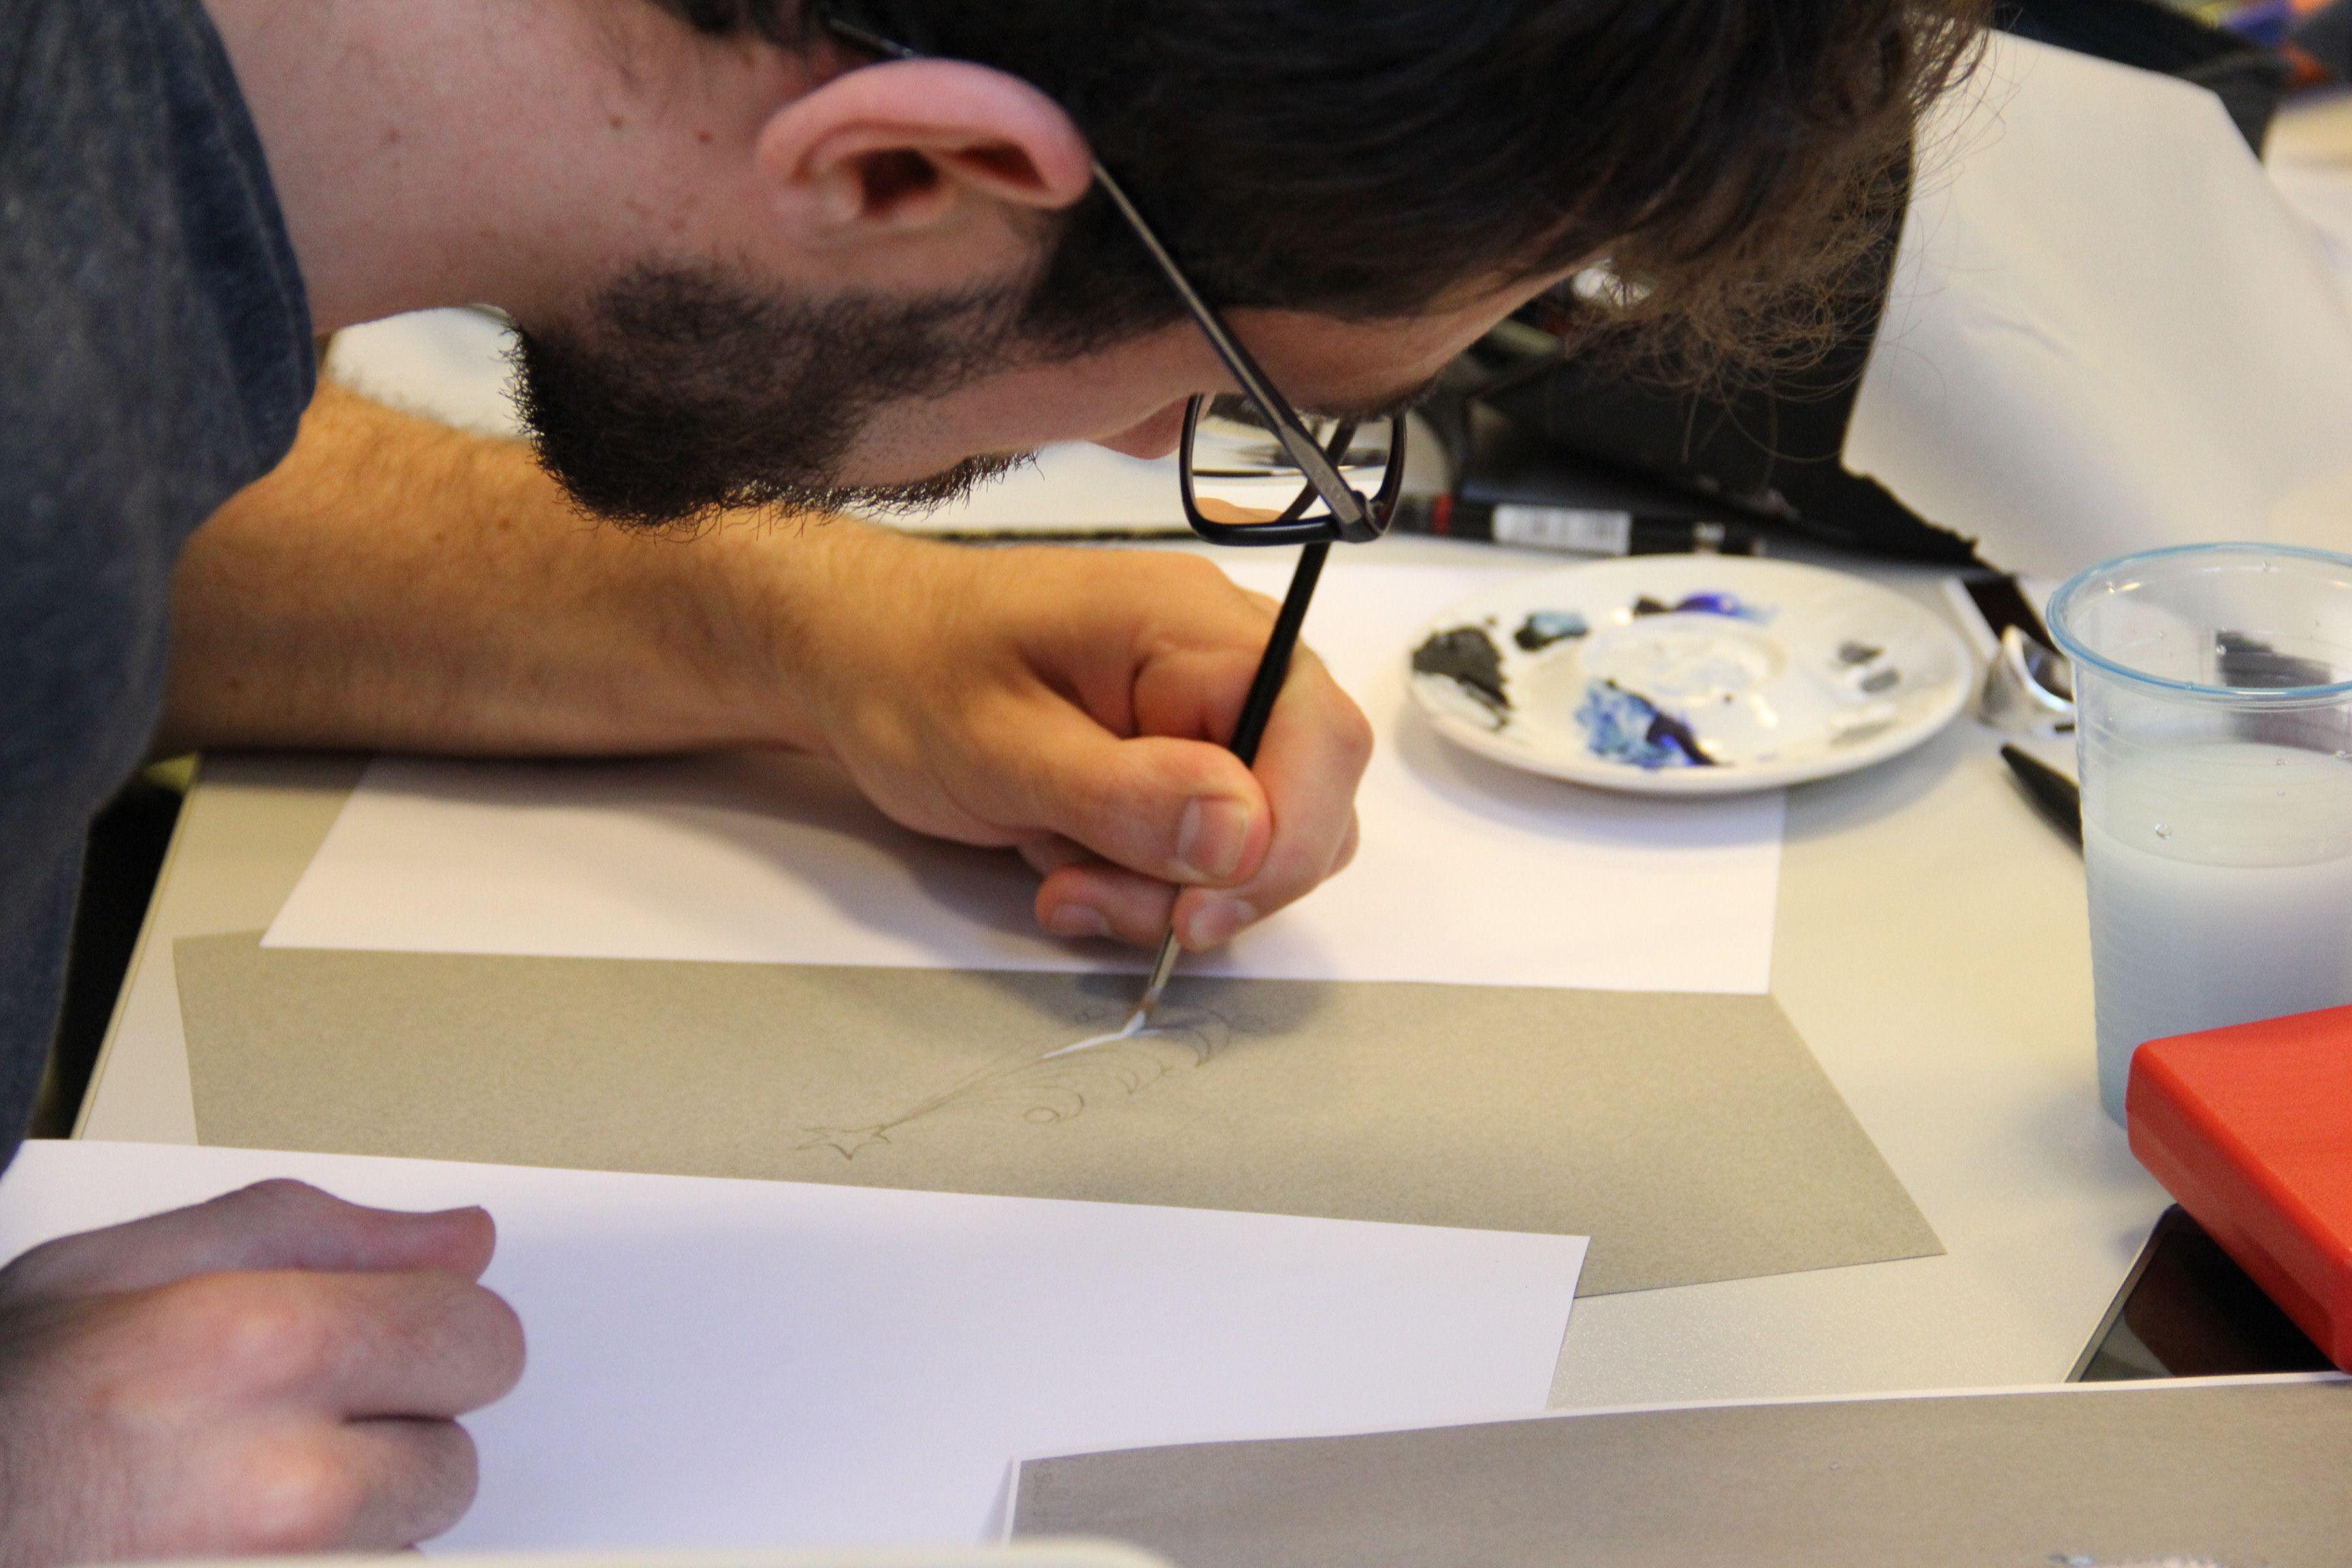 Creative Academy | MANUAL RENDERING #creativeacademy #manualrendering #drawings